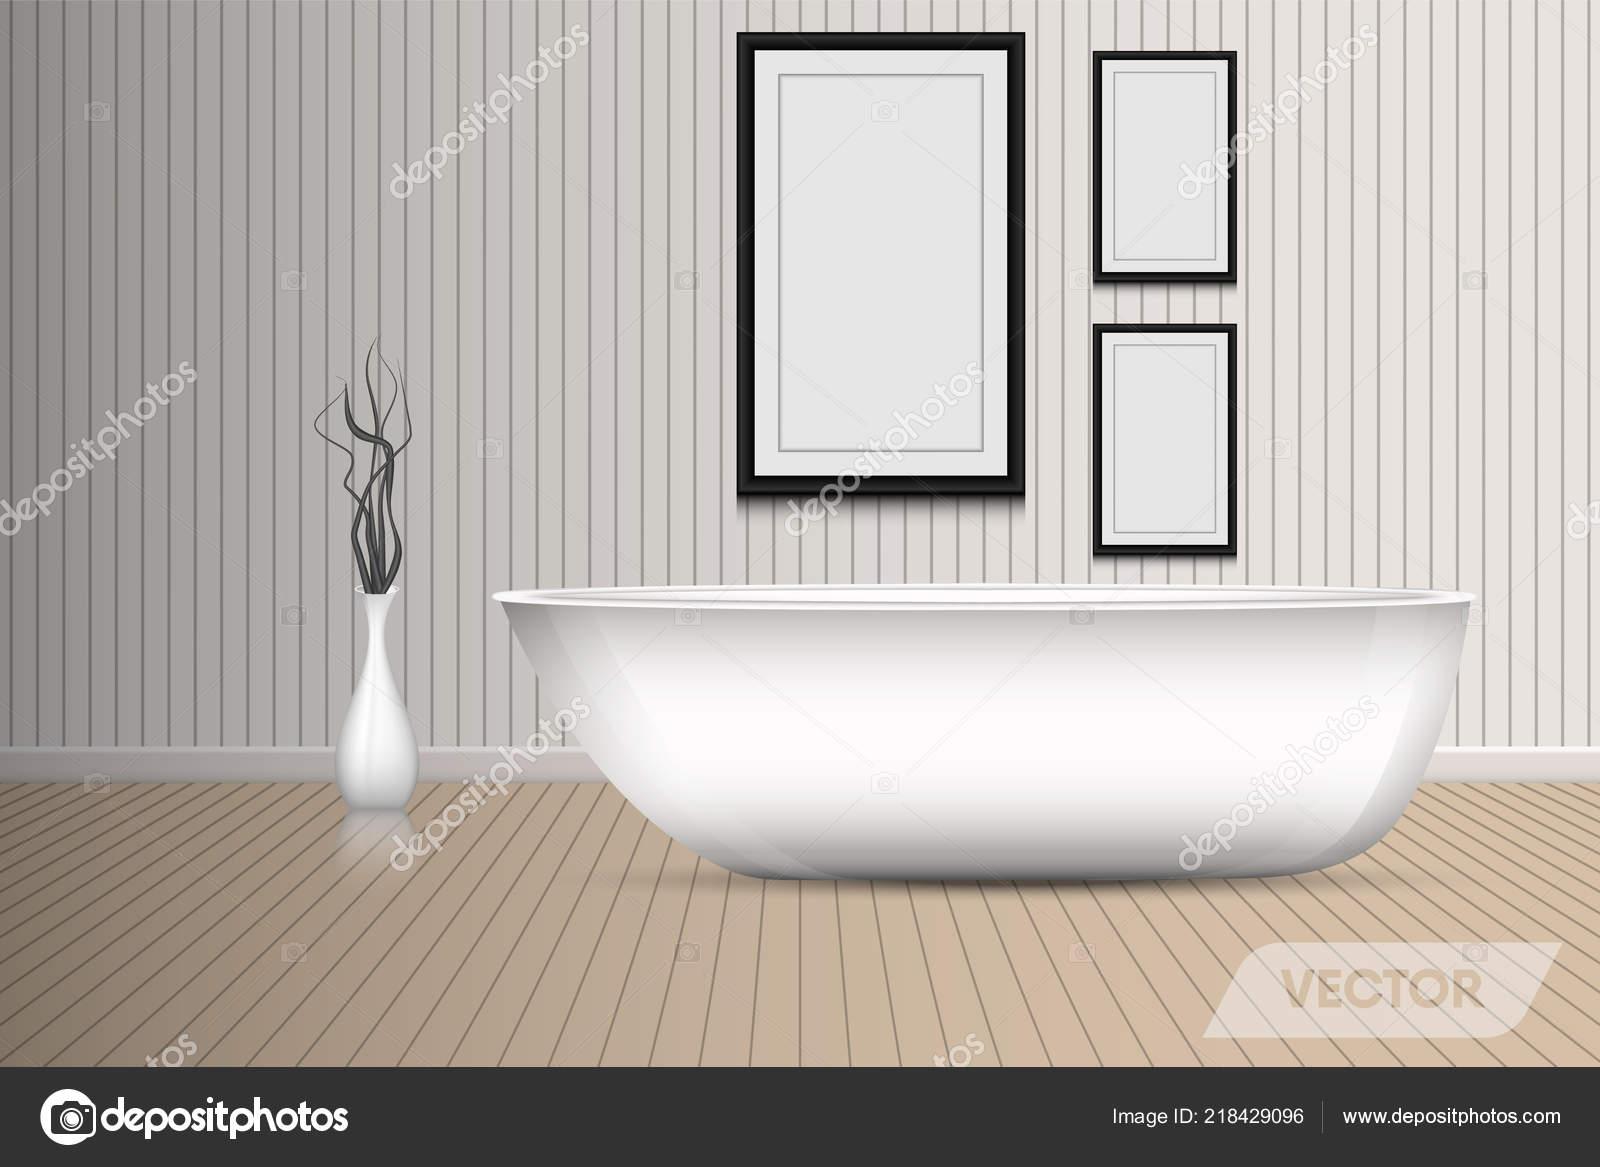 Vasche Da Bagno Design Moderno : Vasca bagno doccia moderno interior design decorative art vettore